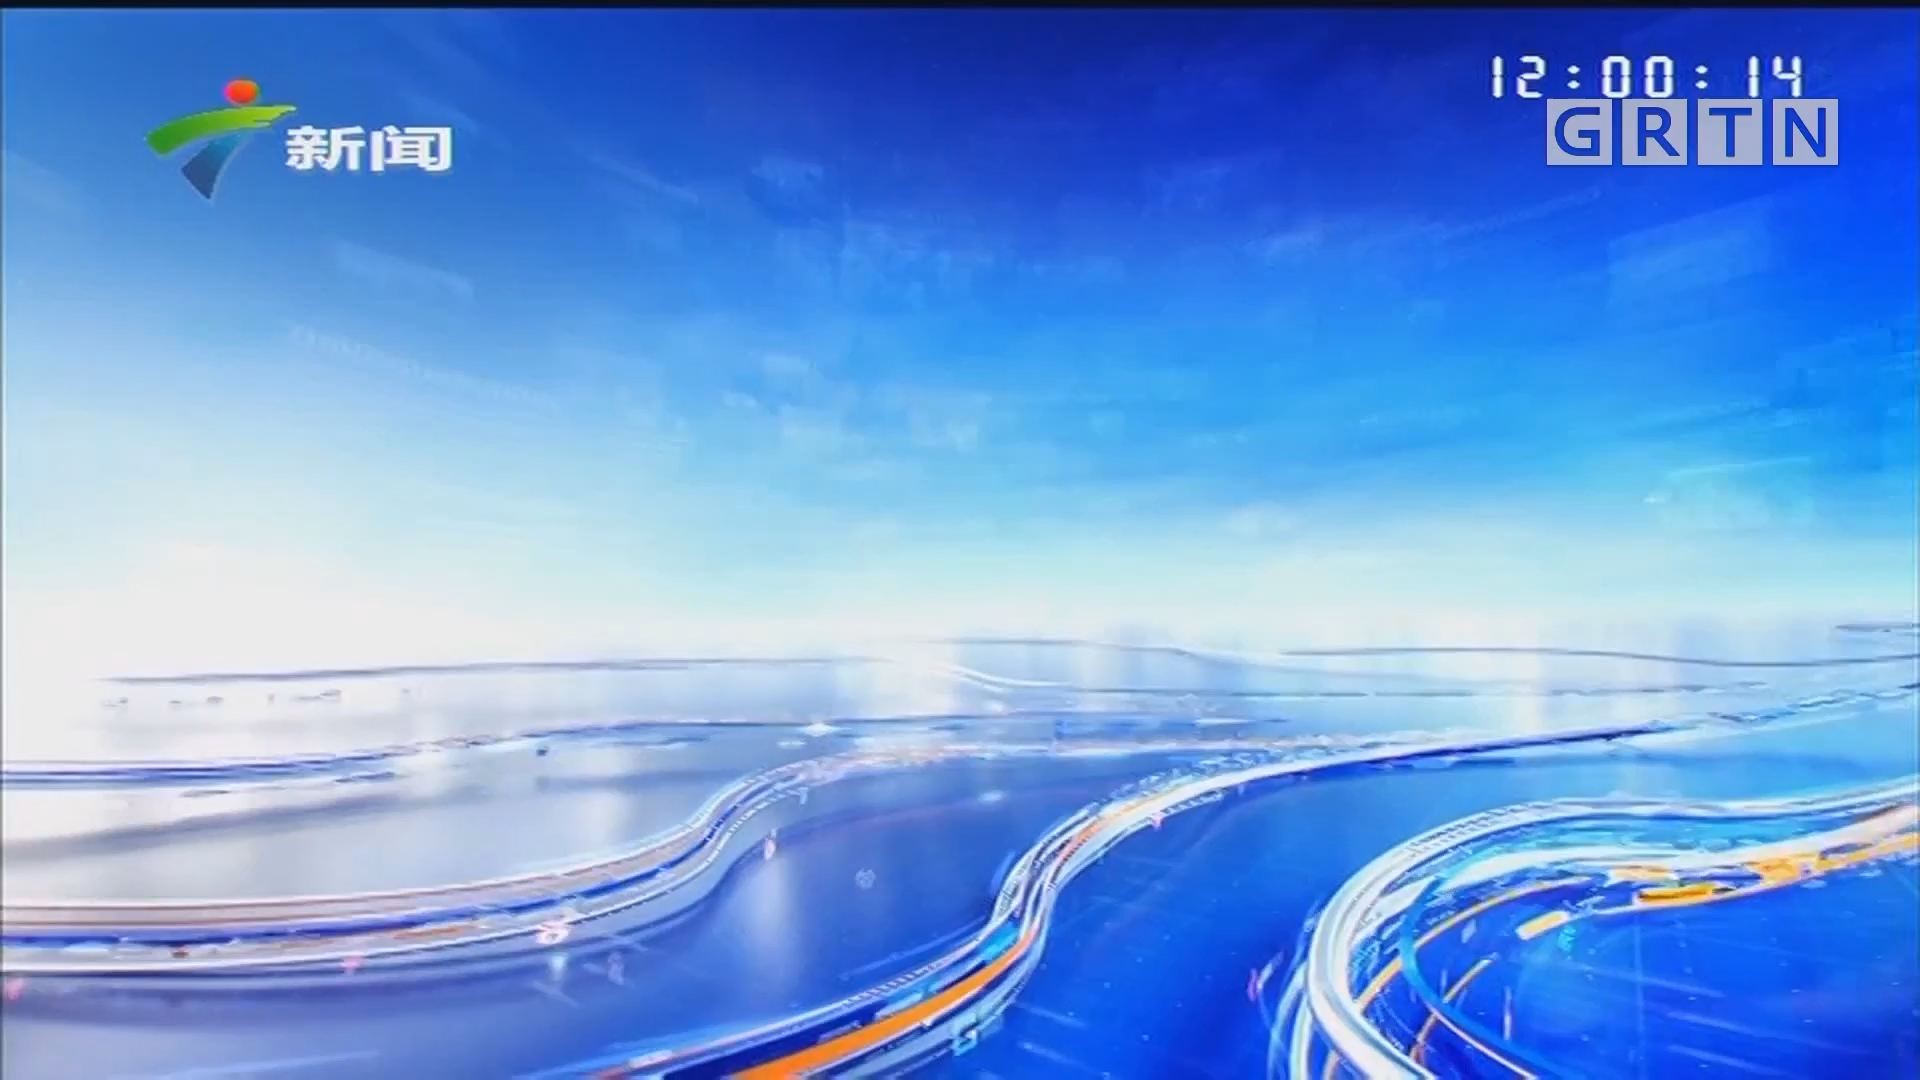 [HD][2019-06-28]直播广东:直击发布会:2019广州马拉松赛6月30日启动报名